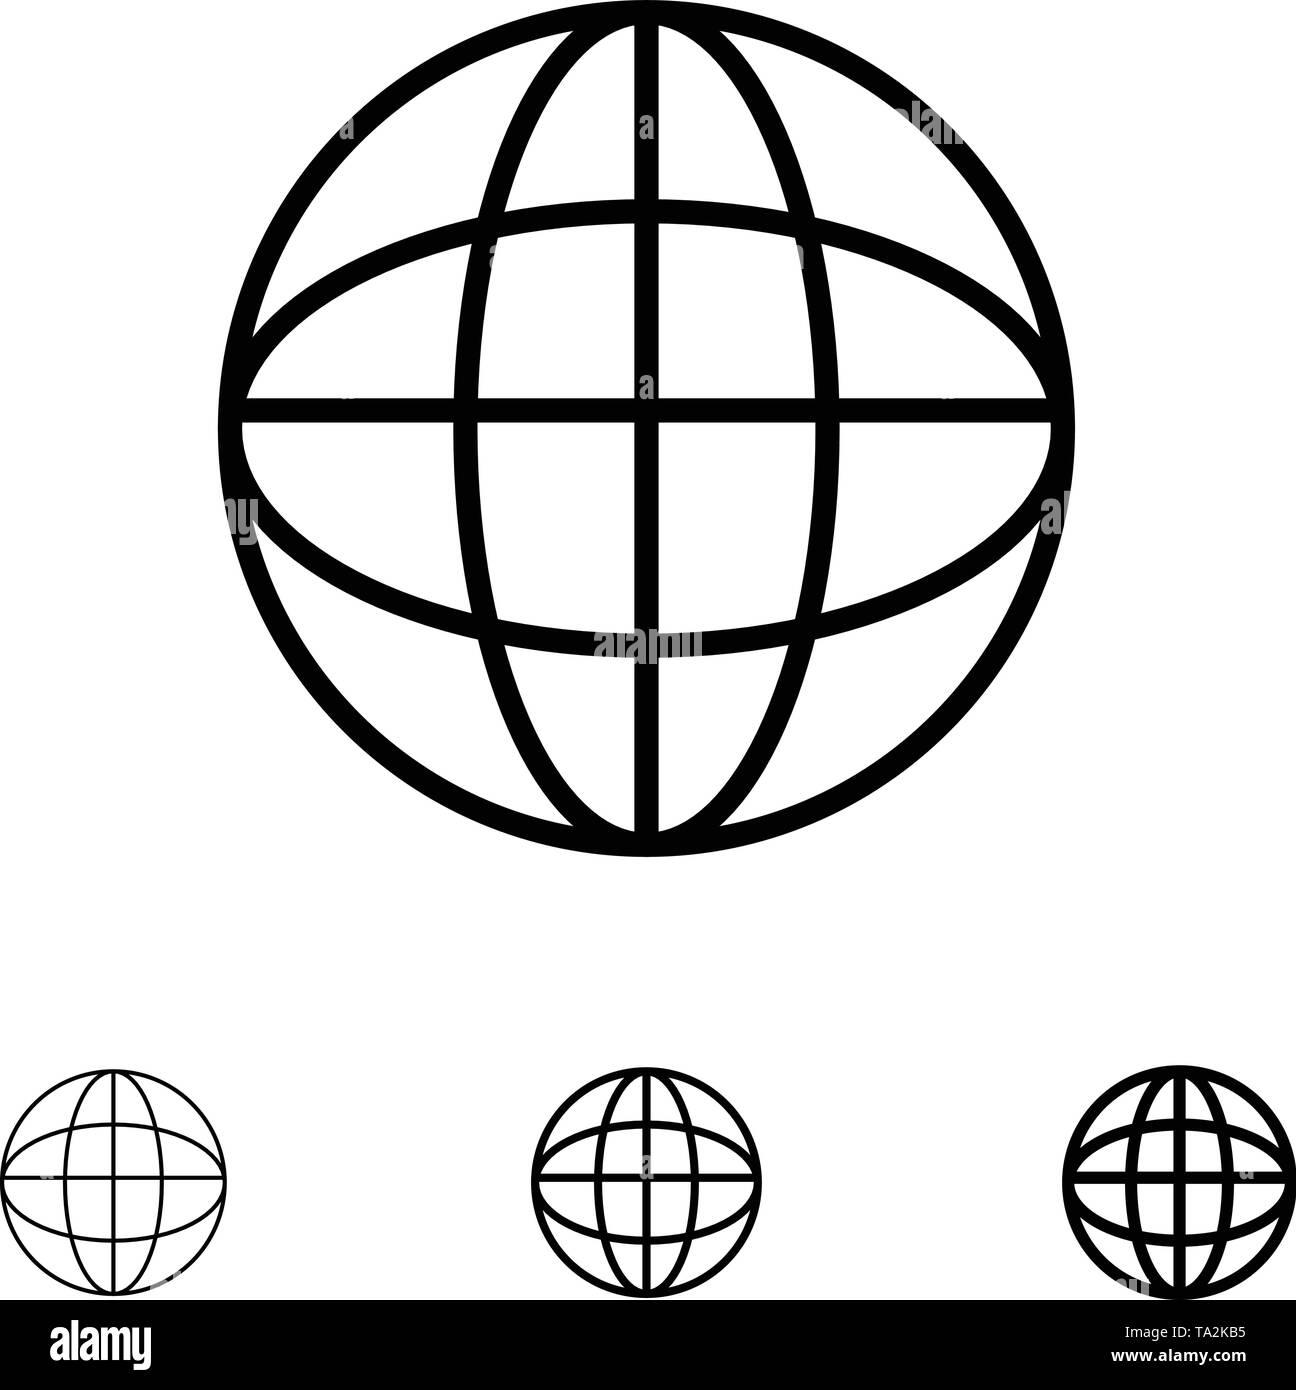 Global, Location, Internet, World Bold and thin black line icon set - Stock Image